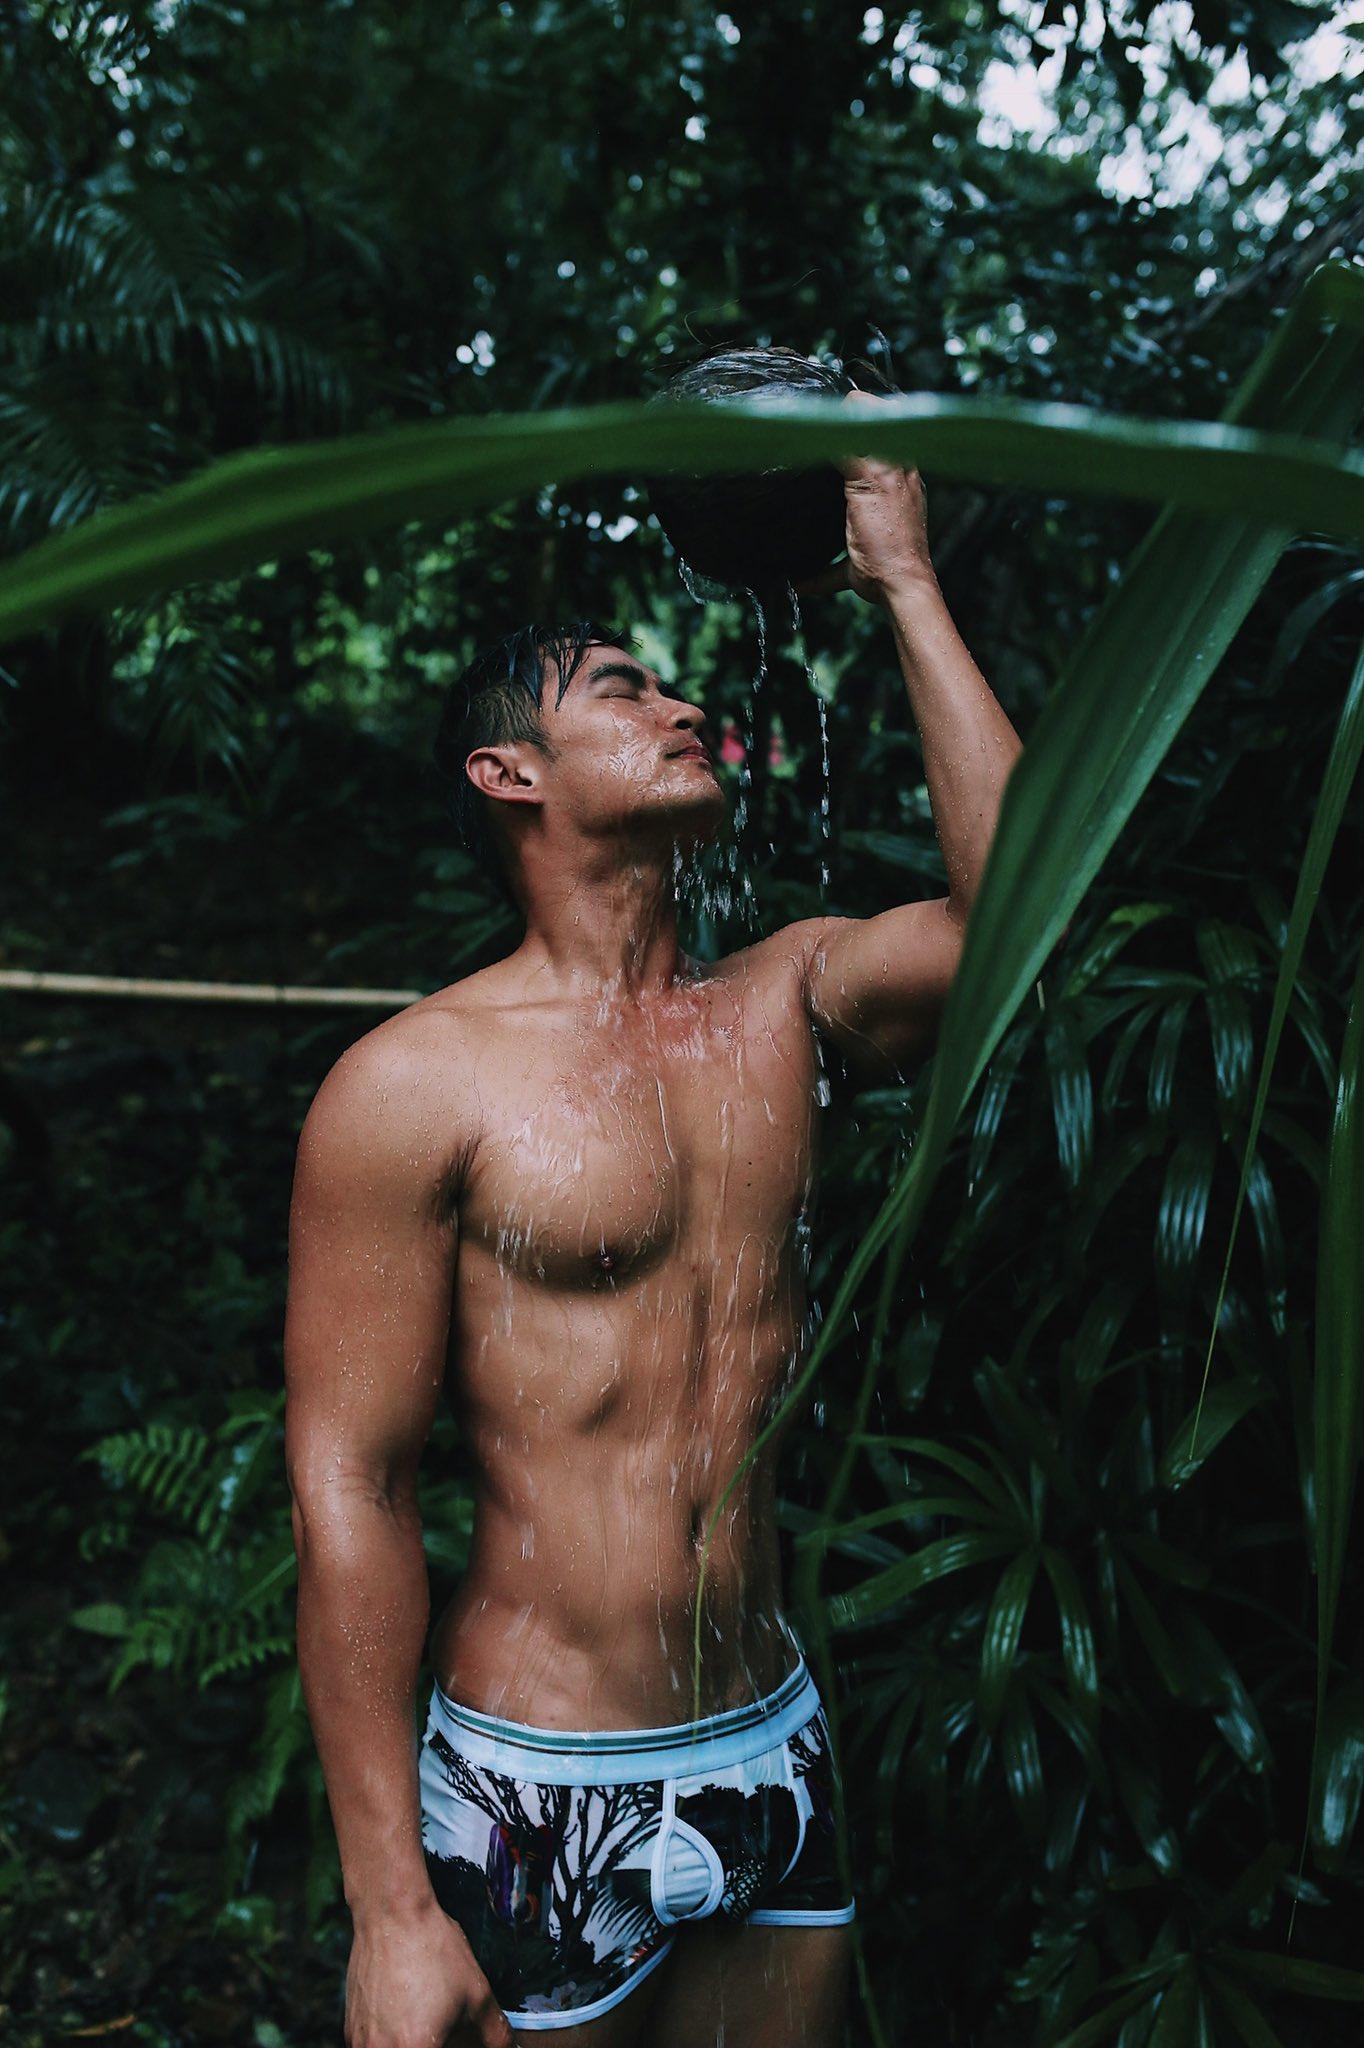 2011 - 2012 | Manhunt - Mister International - Mister Universe Model | Hawaii - USA | Rhonee Rojas - Page 35 EPanBAaUYAI4tba?format=jpg&name=4096x4096